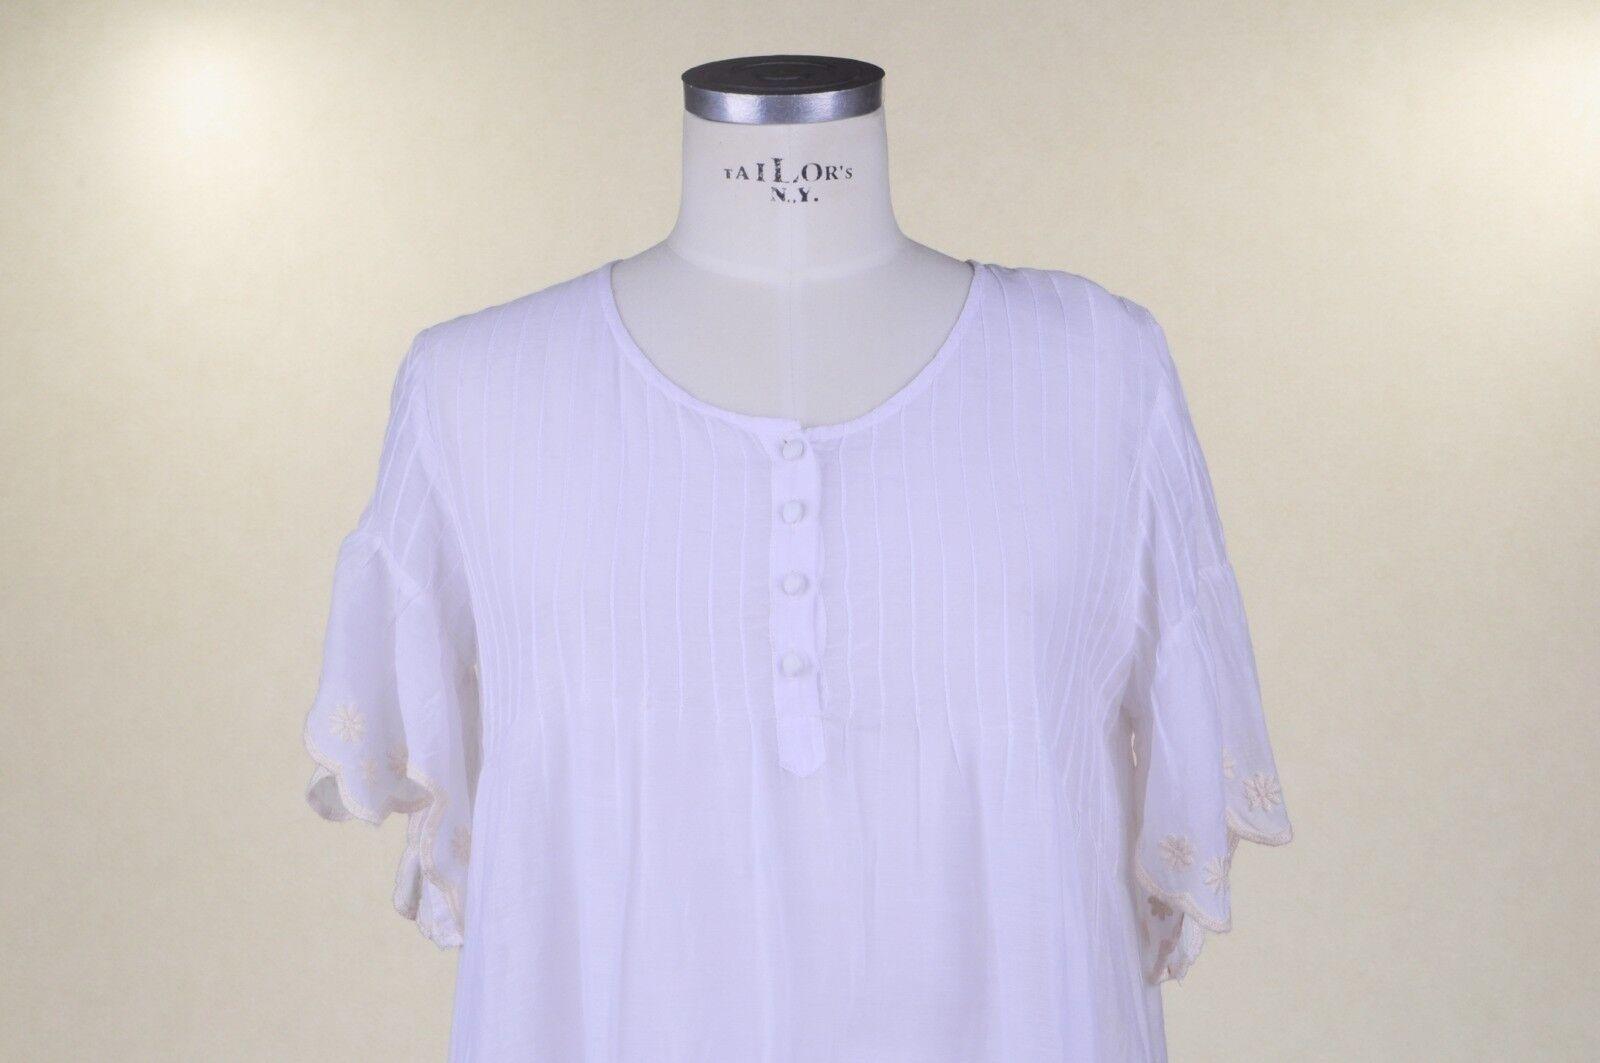 Twin Set - Shirts-Blouses - woman - bluee - 673417C180601